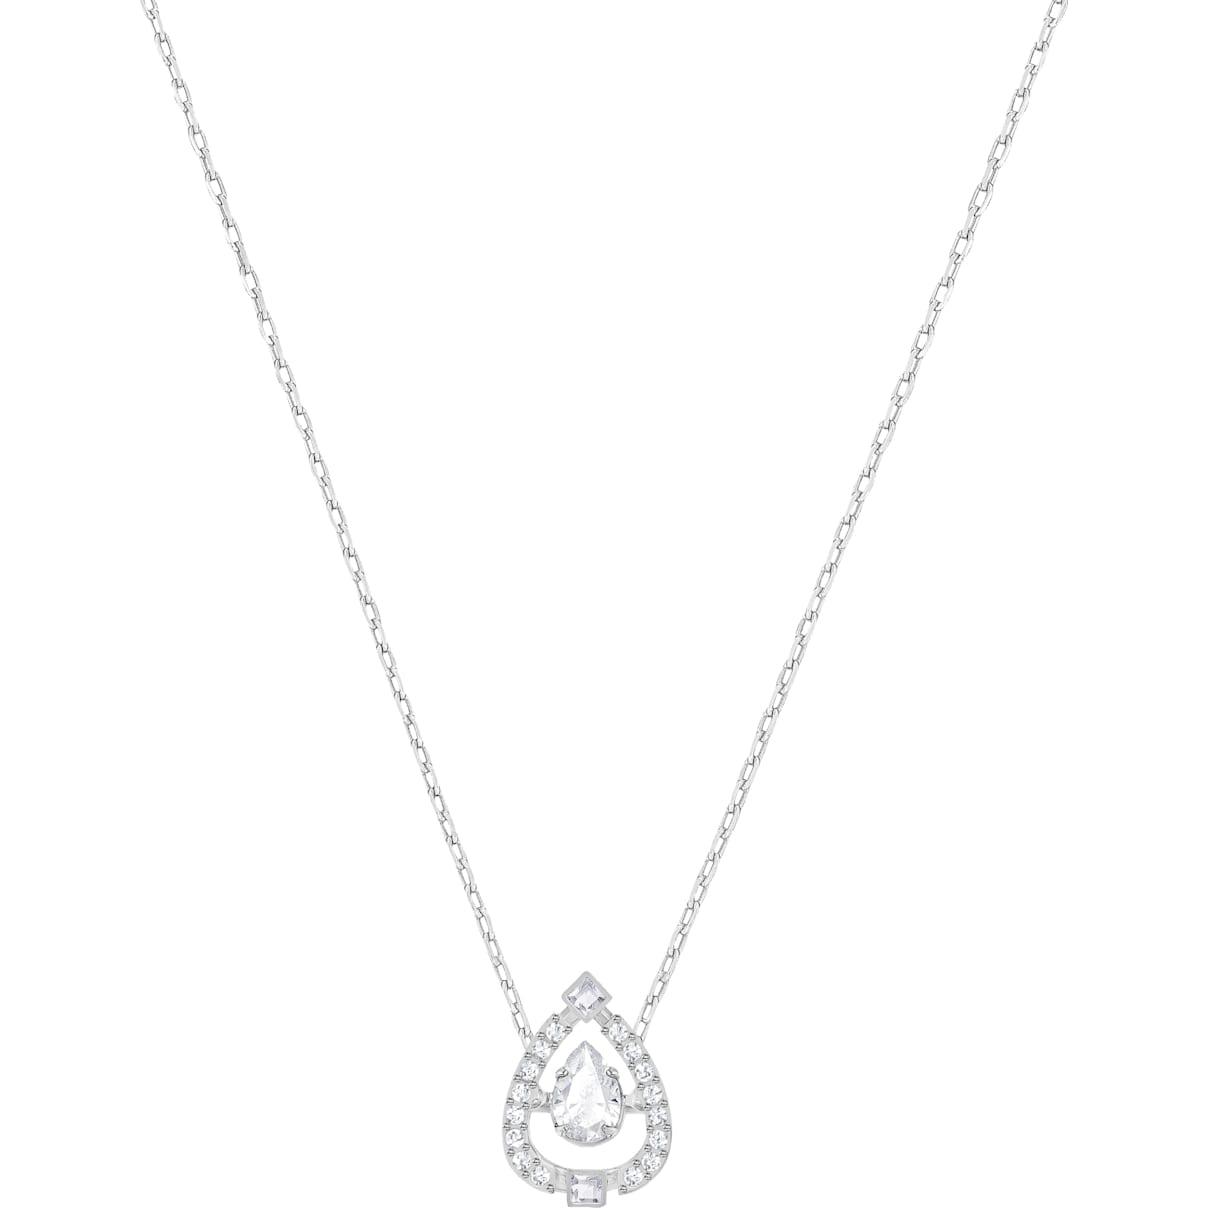 Swarovski Swarovski Sparkling Dance Pear Necklace, White, Rhodium plated